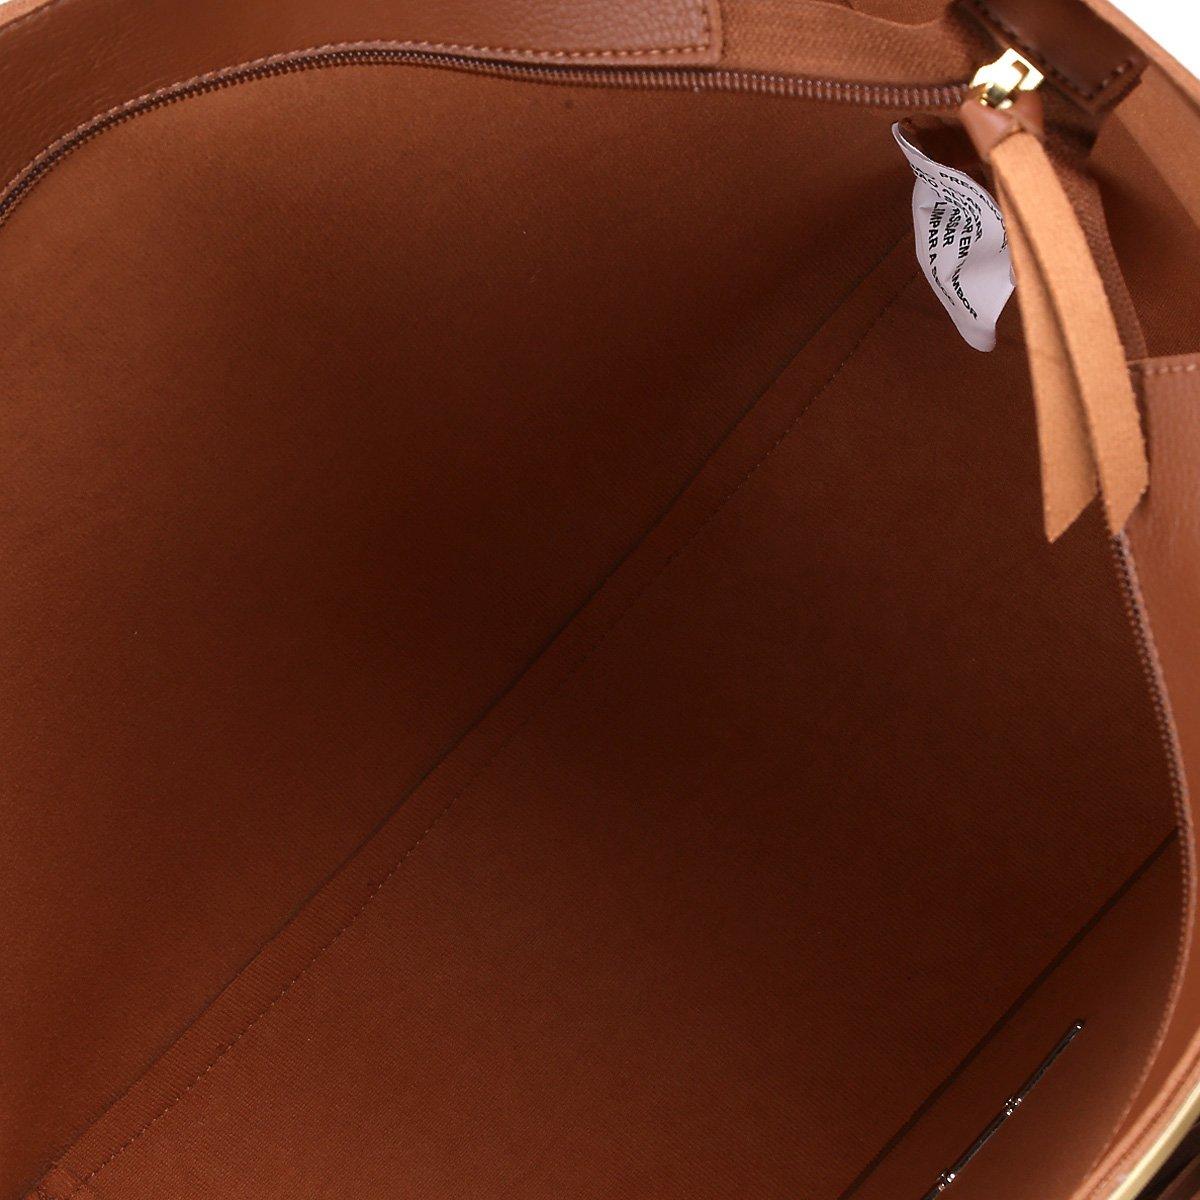 2e13489ca7 Bolsa Colcci Shopper Básica Feminina - Compre Agora | Zattini